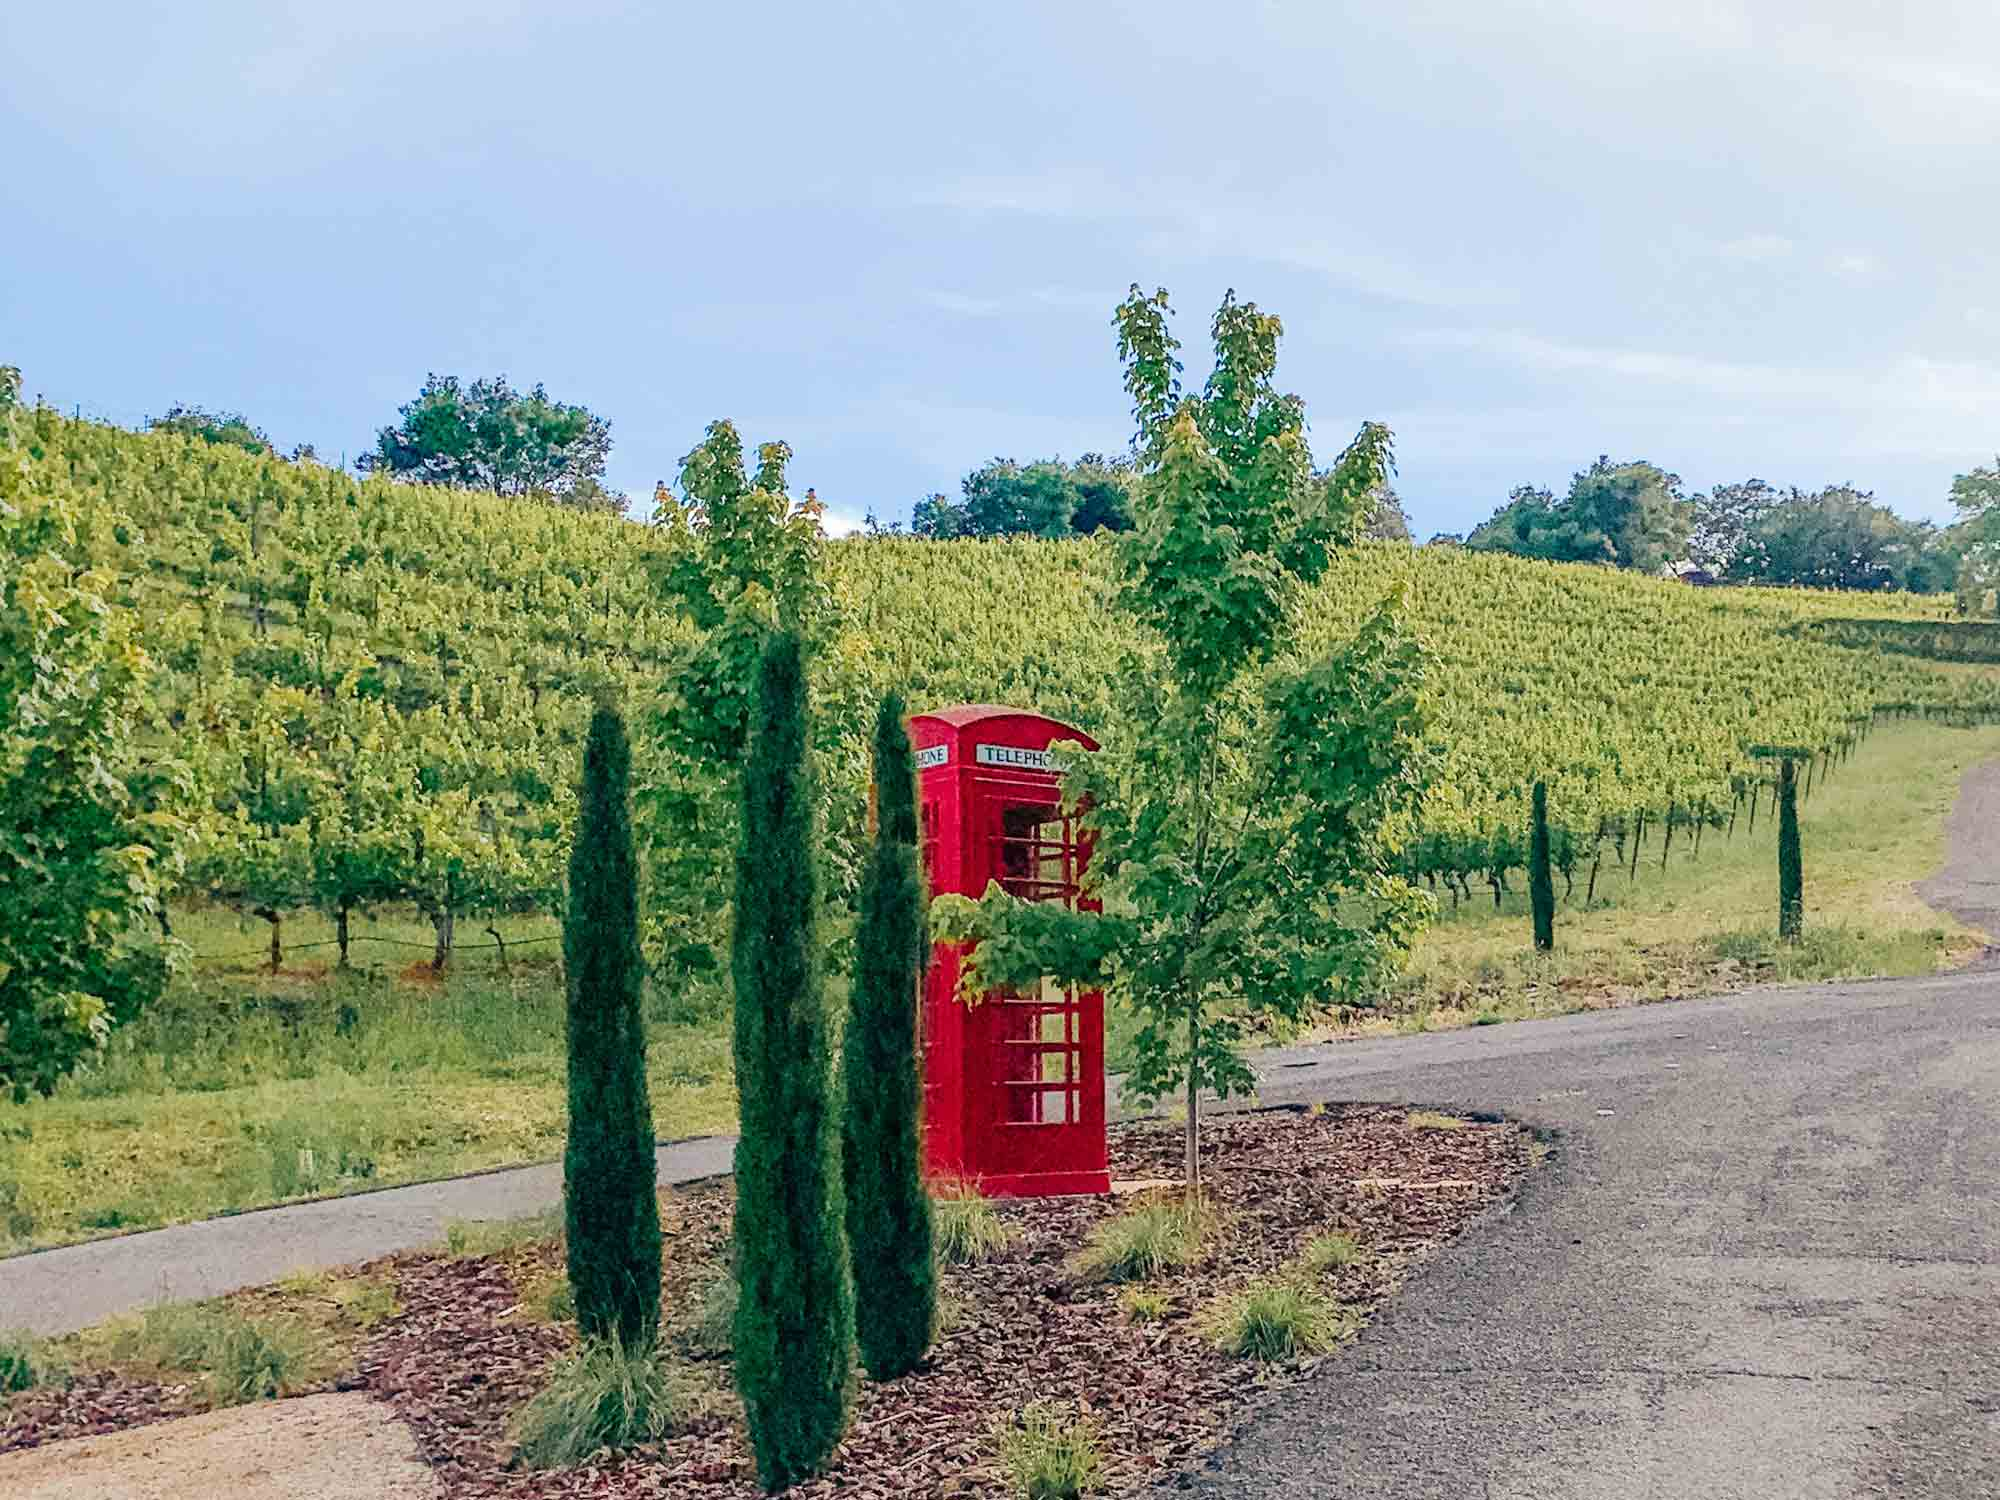 newton-vineyard-red-telephone-booth